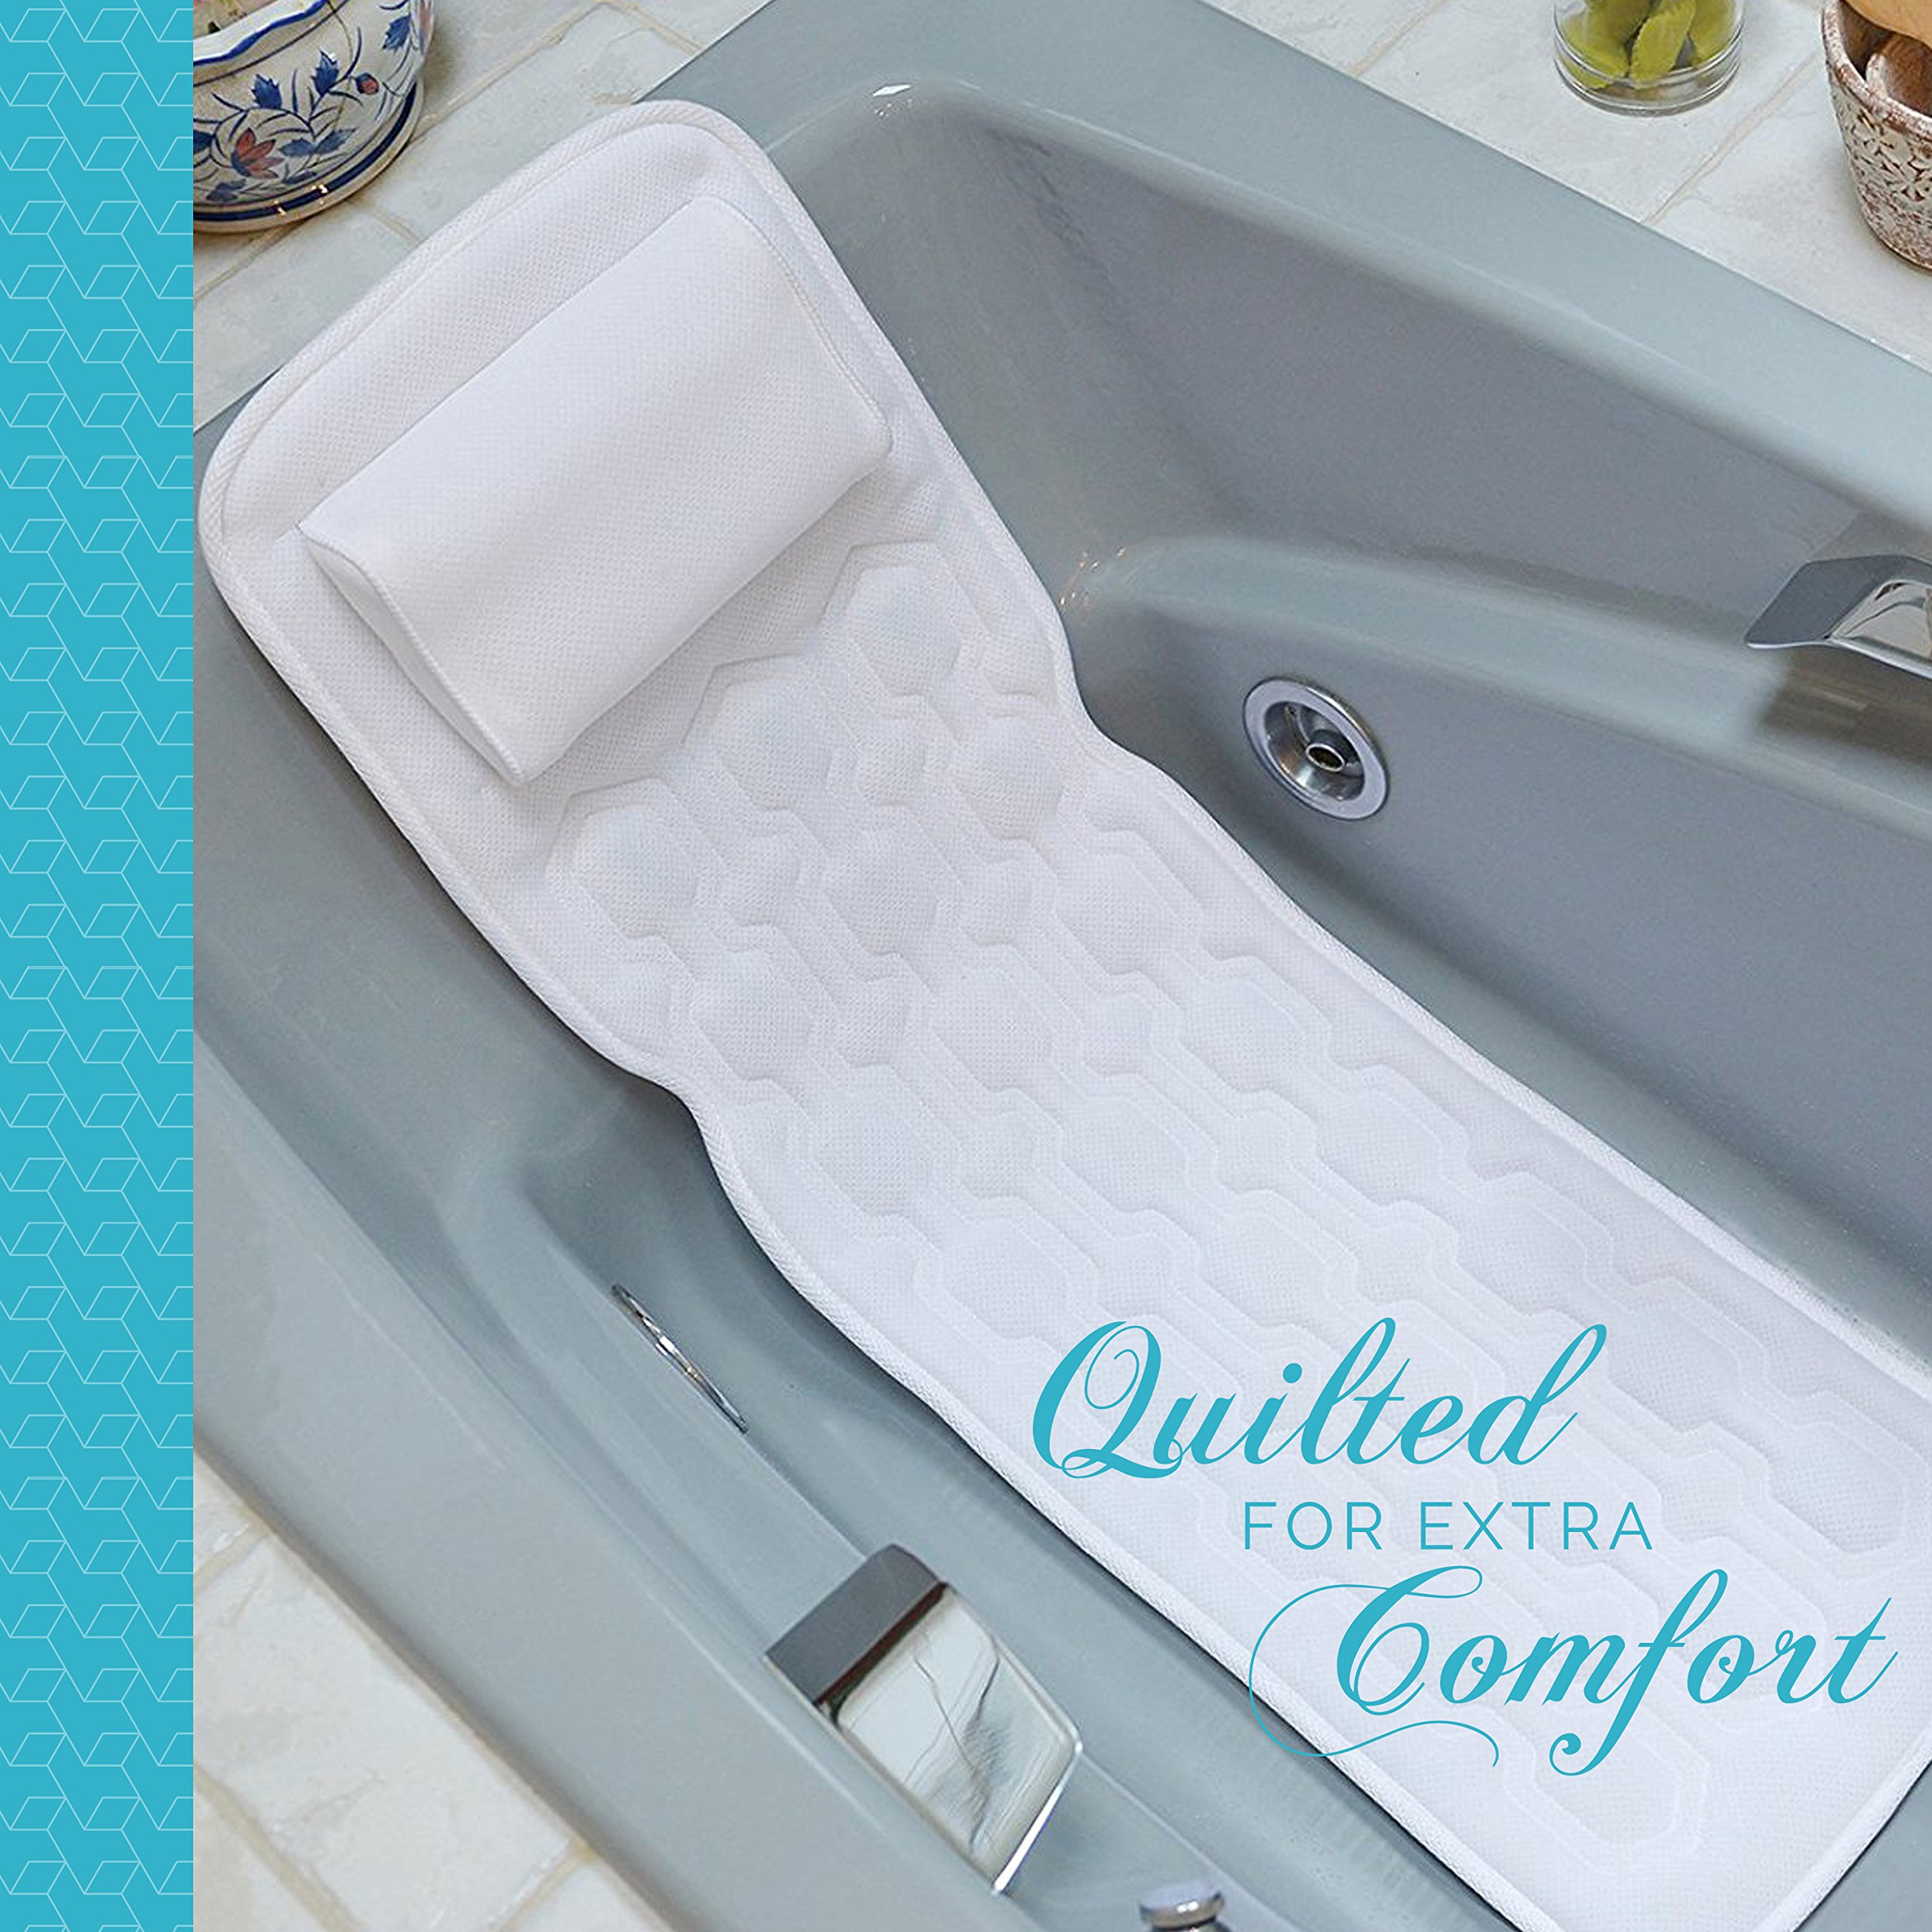 ComfySure Full Body Spa Bath Mattress Pillow - Soft Quilted Bathtub ...